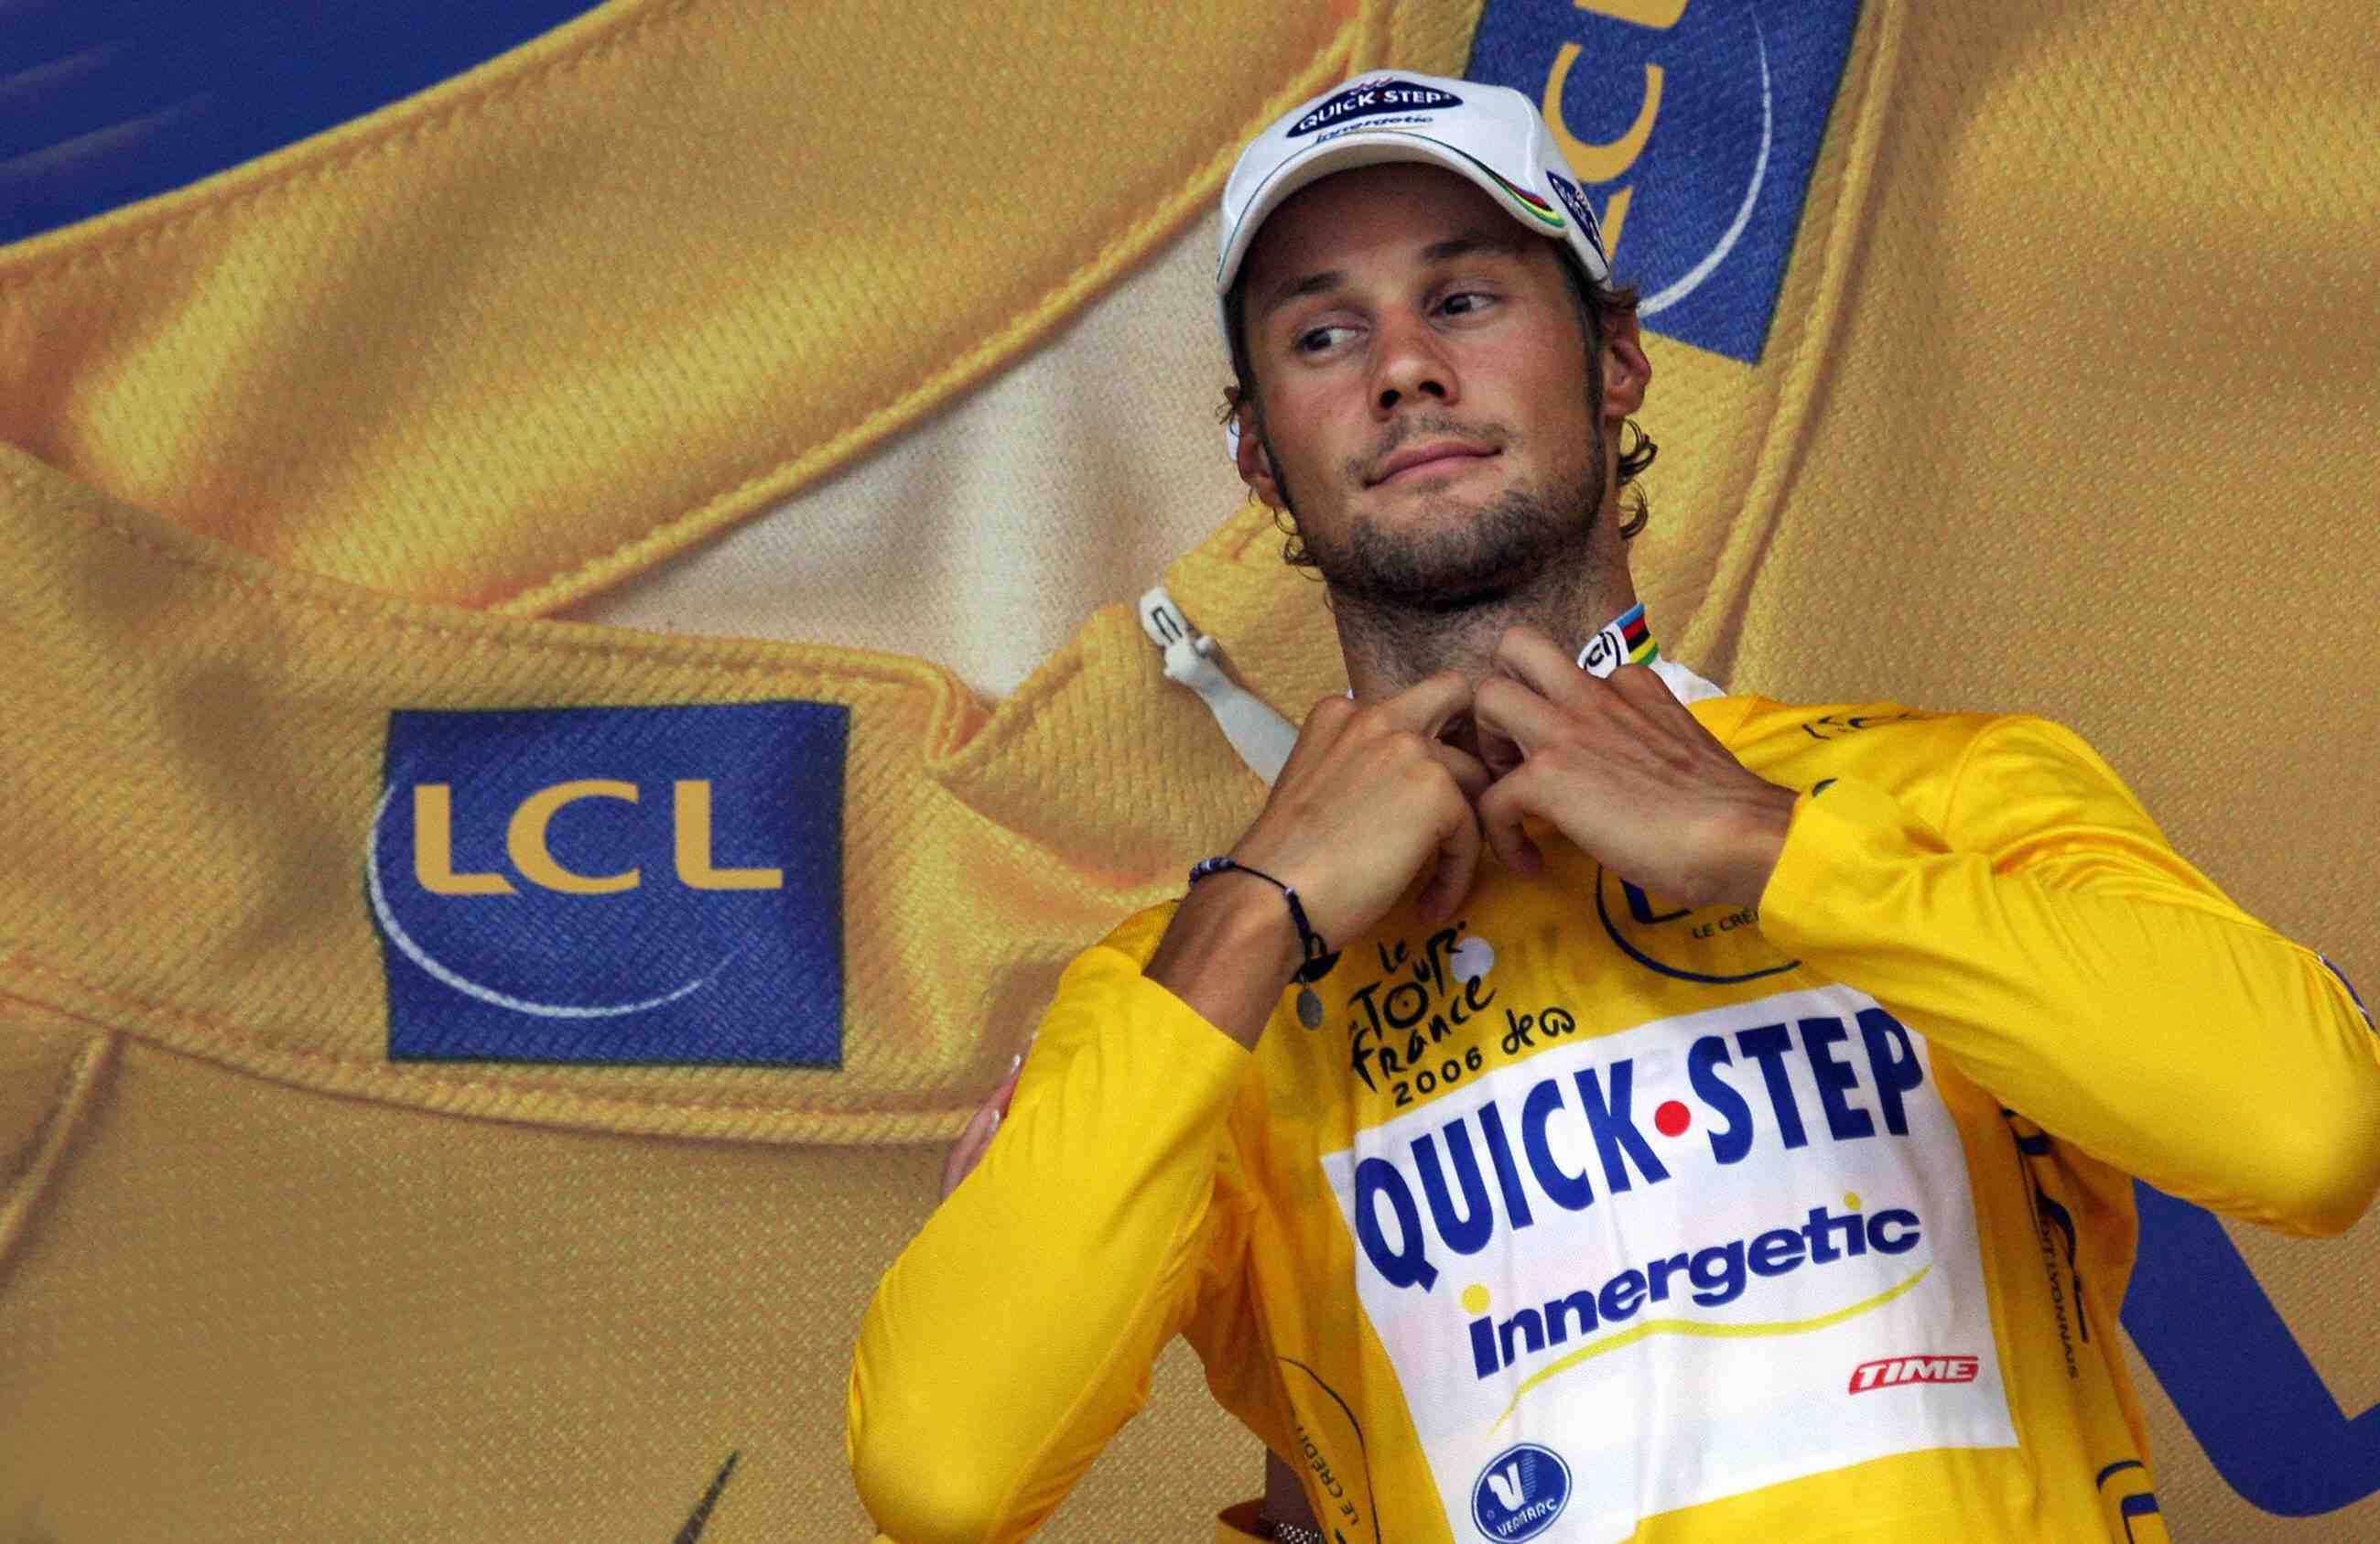 Tom Boonen was the last Belgian to wear yellow, in 2006.